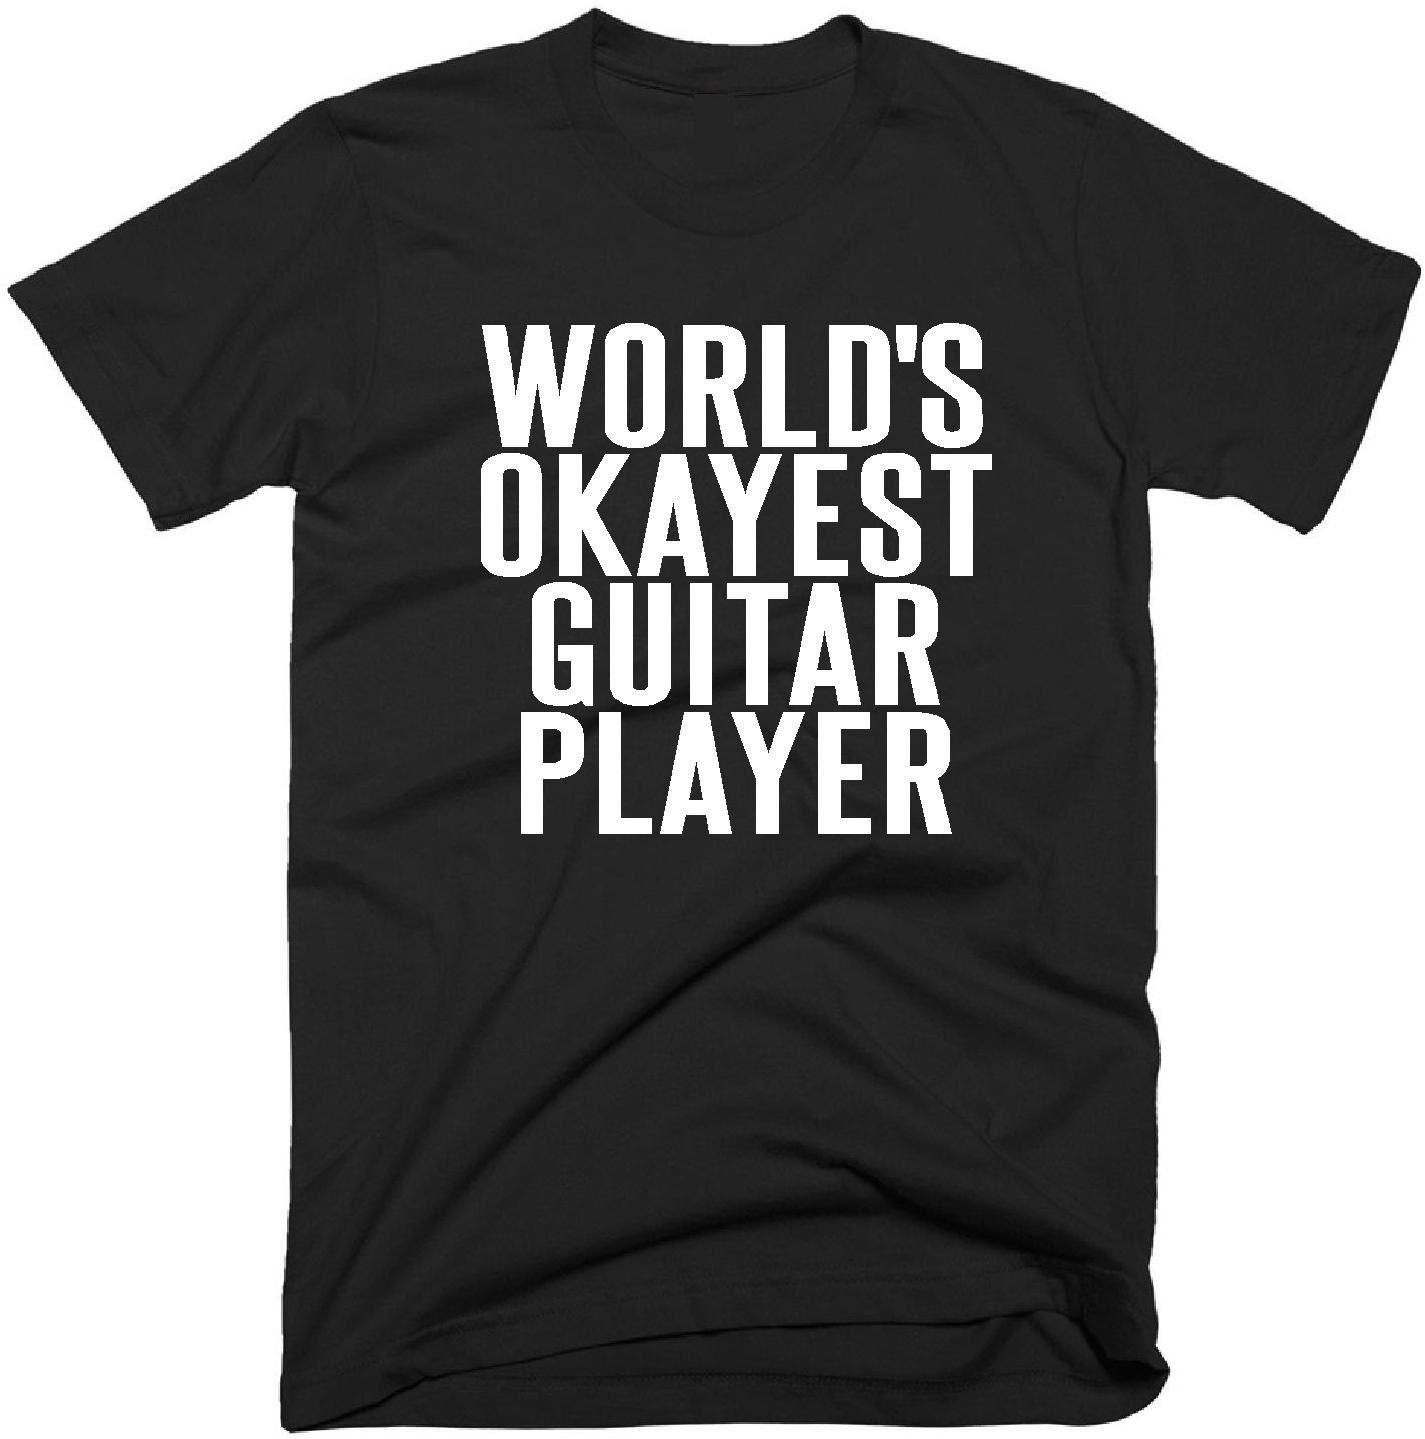 worlds okayest guitar player t shirt guitarist gift music. Black Bedroom Furniture Sets. Home Design Ideas